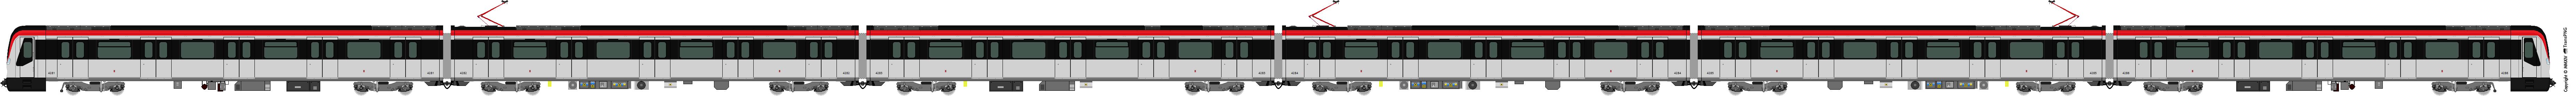 [5403] 港鉄軌道交通(深セン) 5403